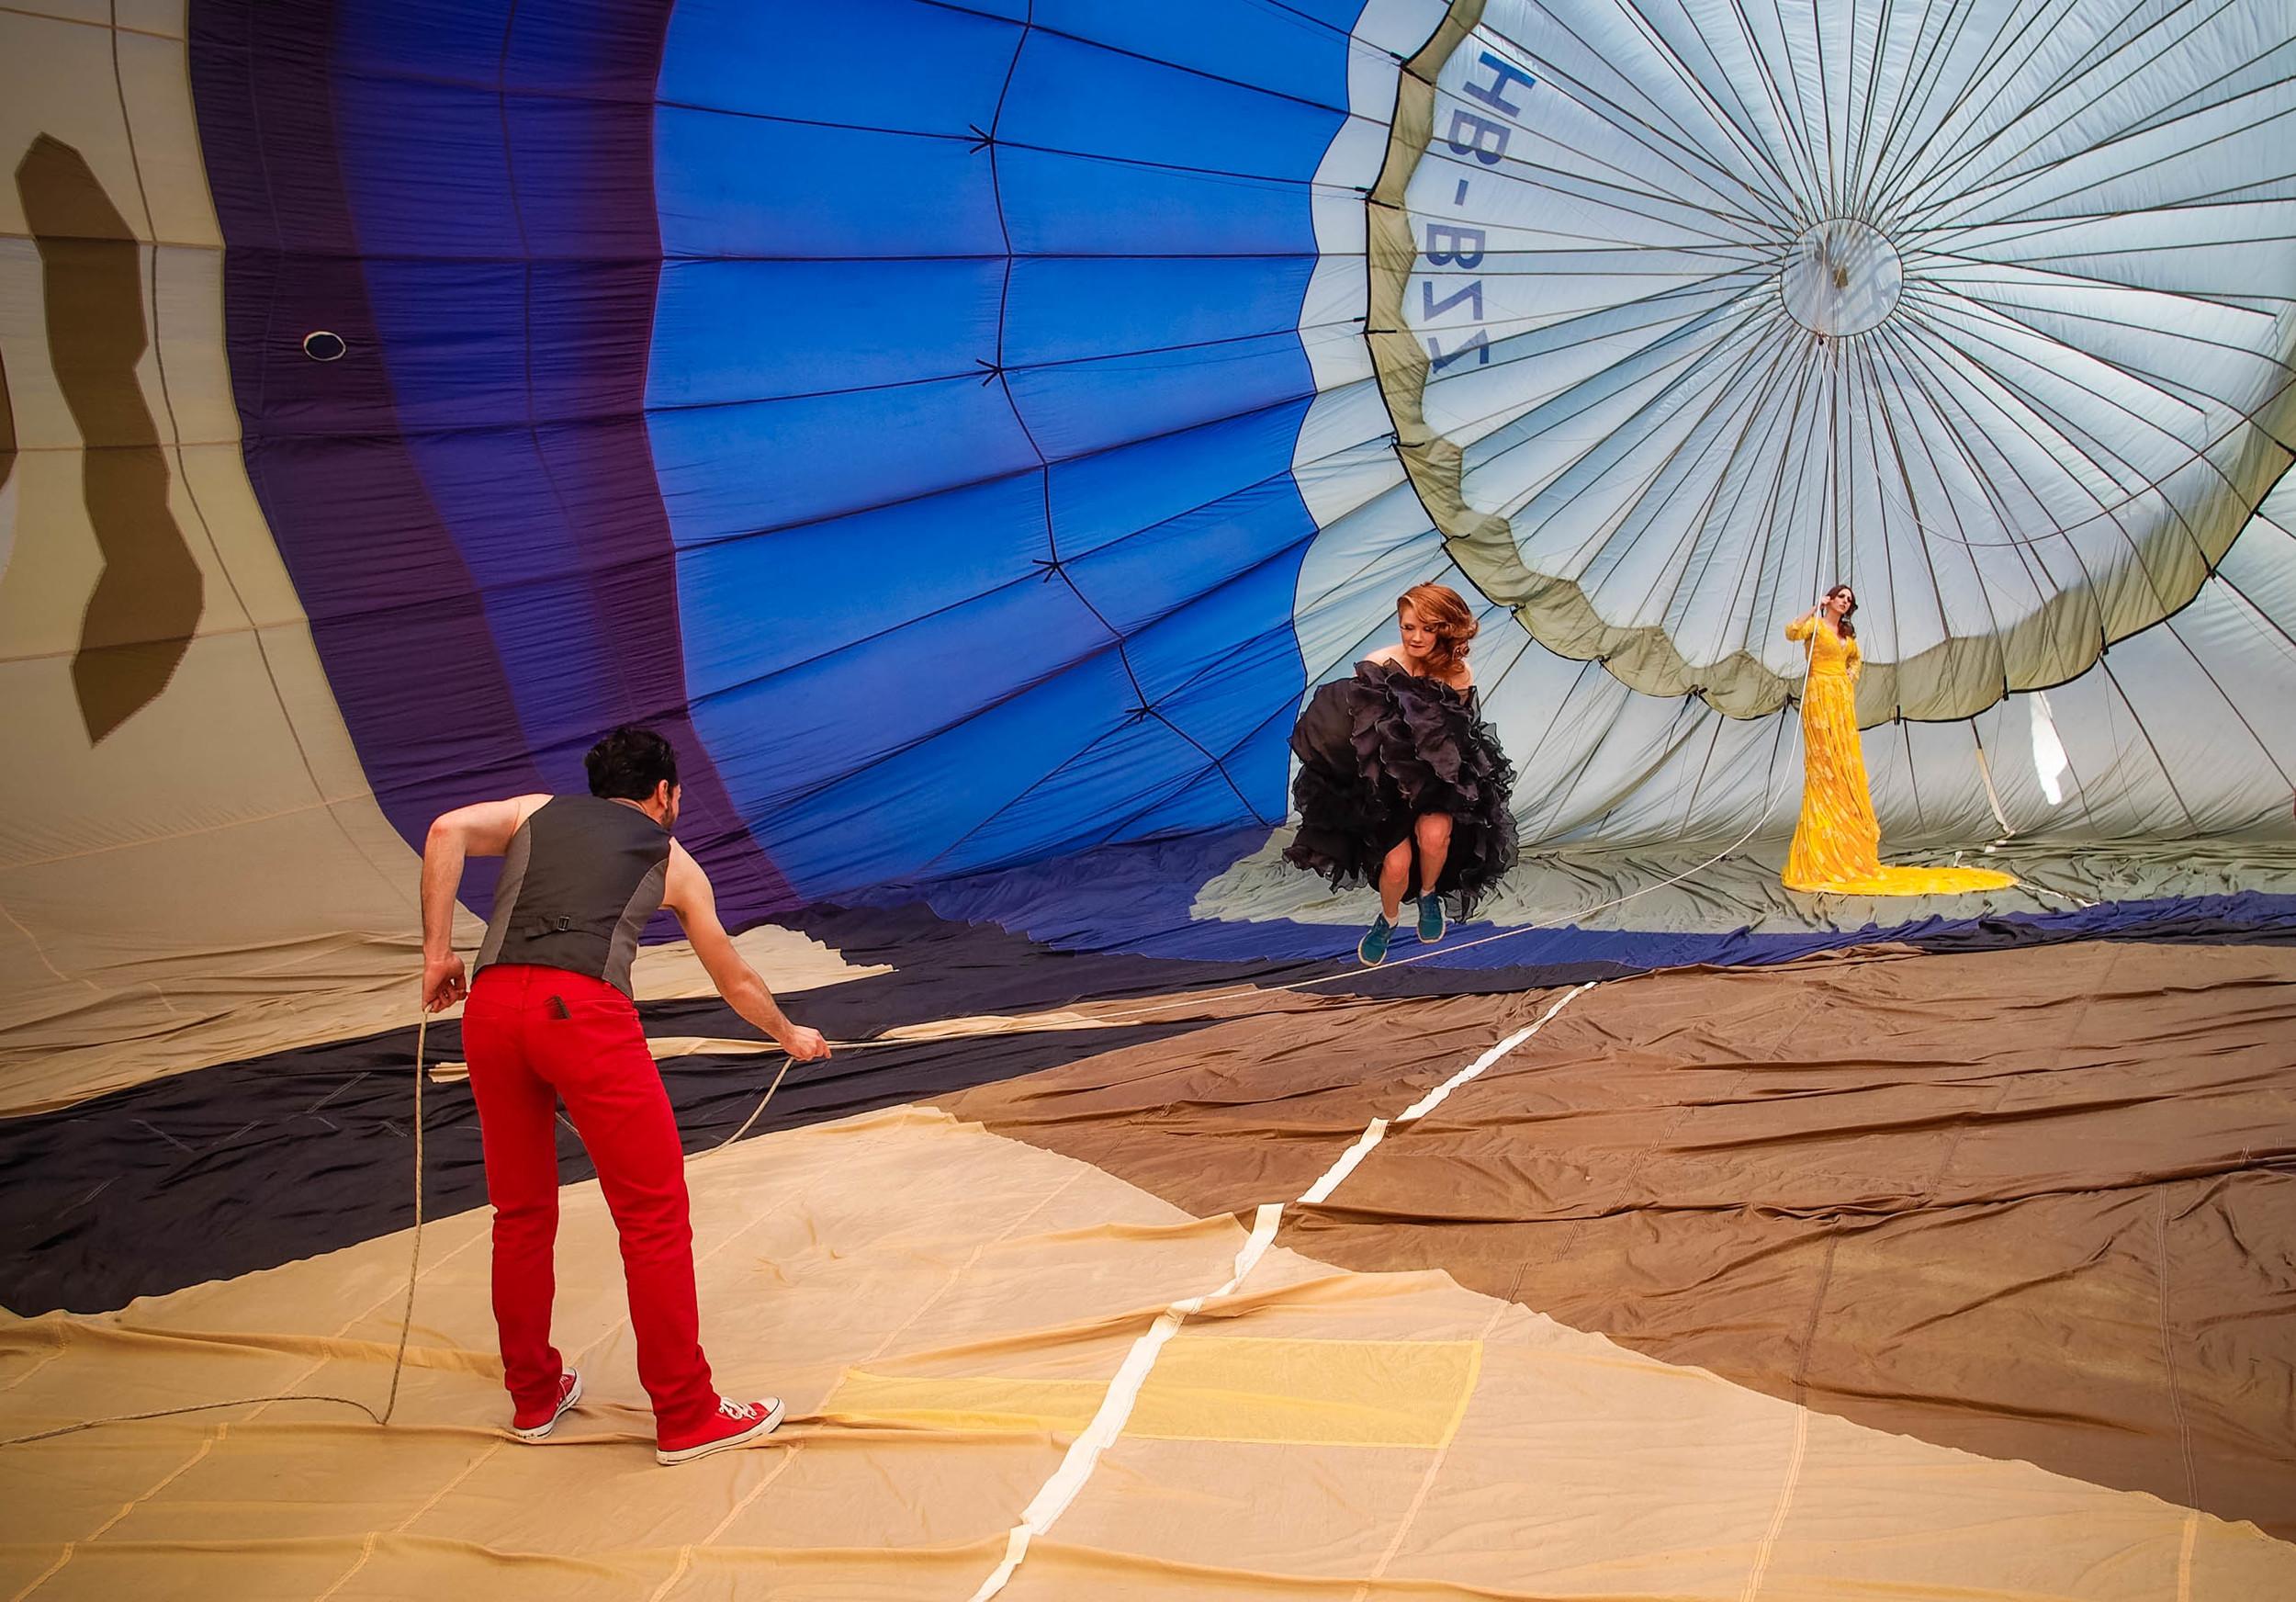 Heisslufballon_OMD-228.jpg